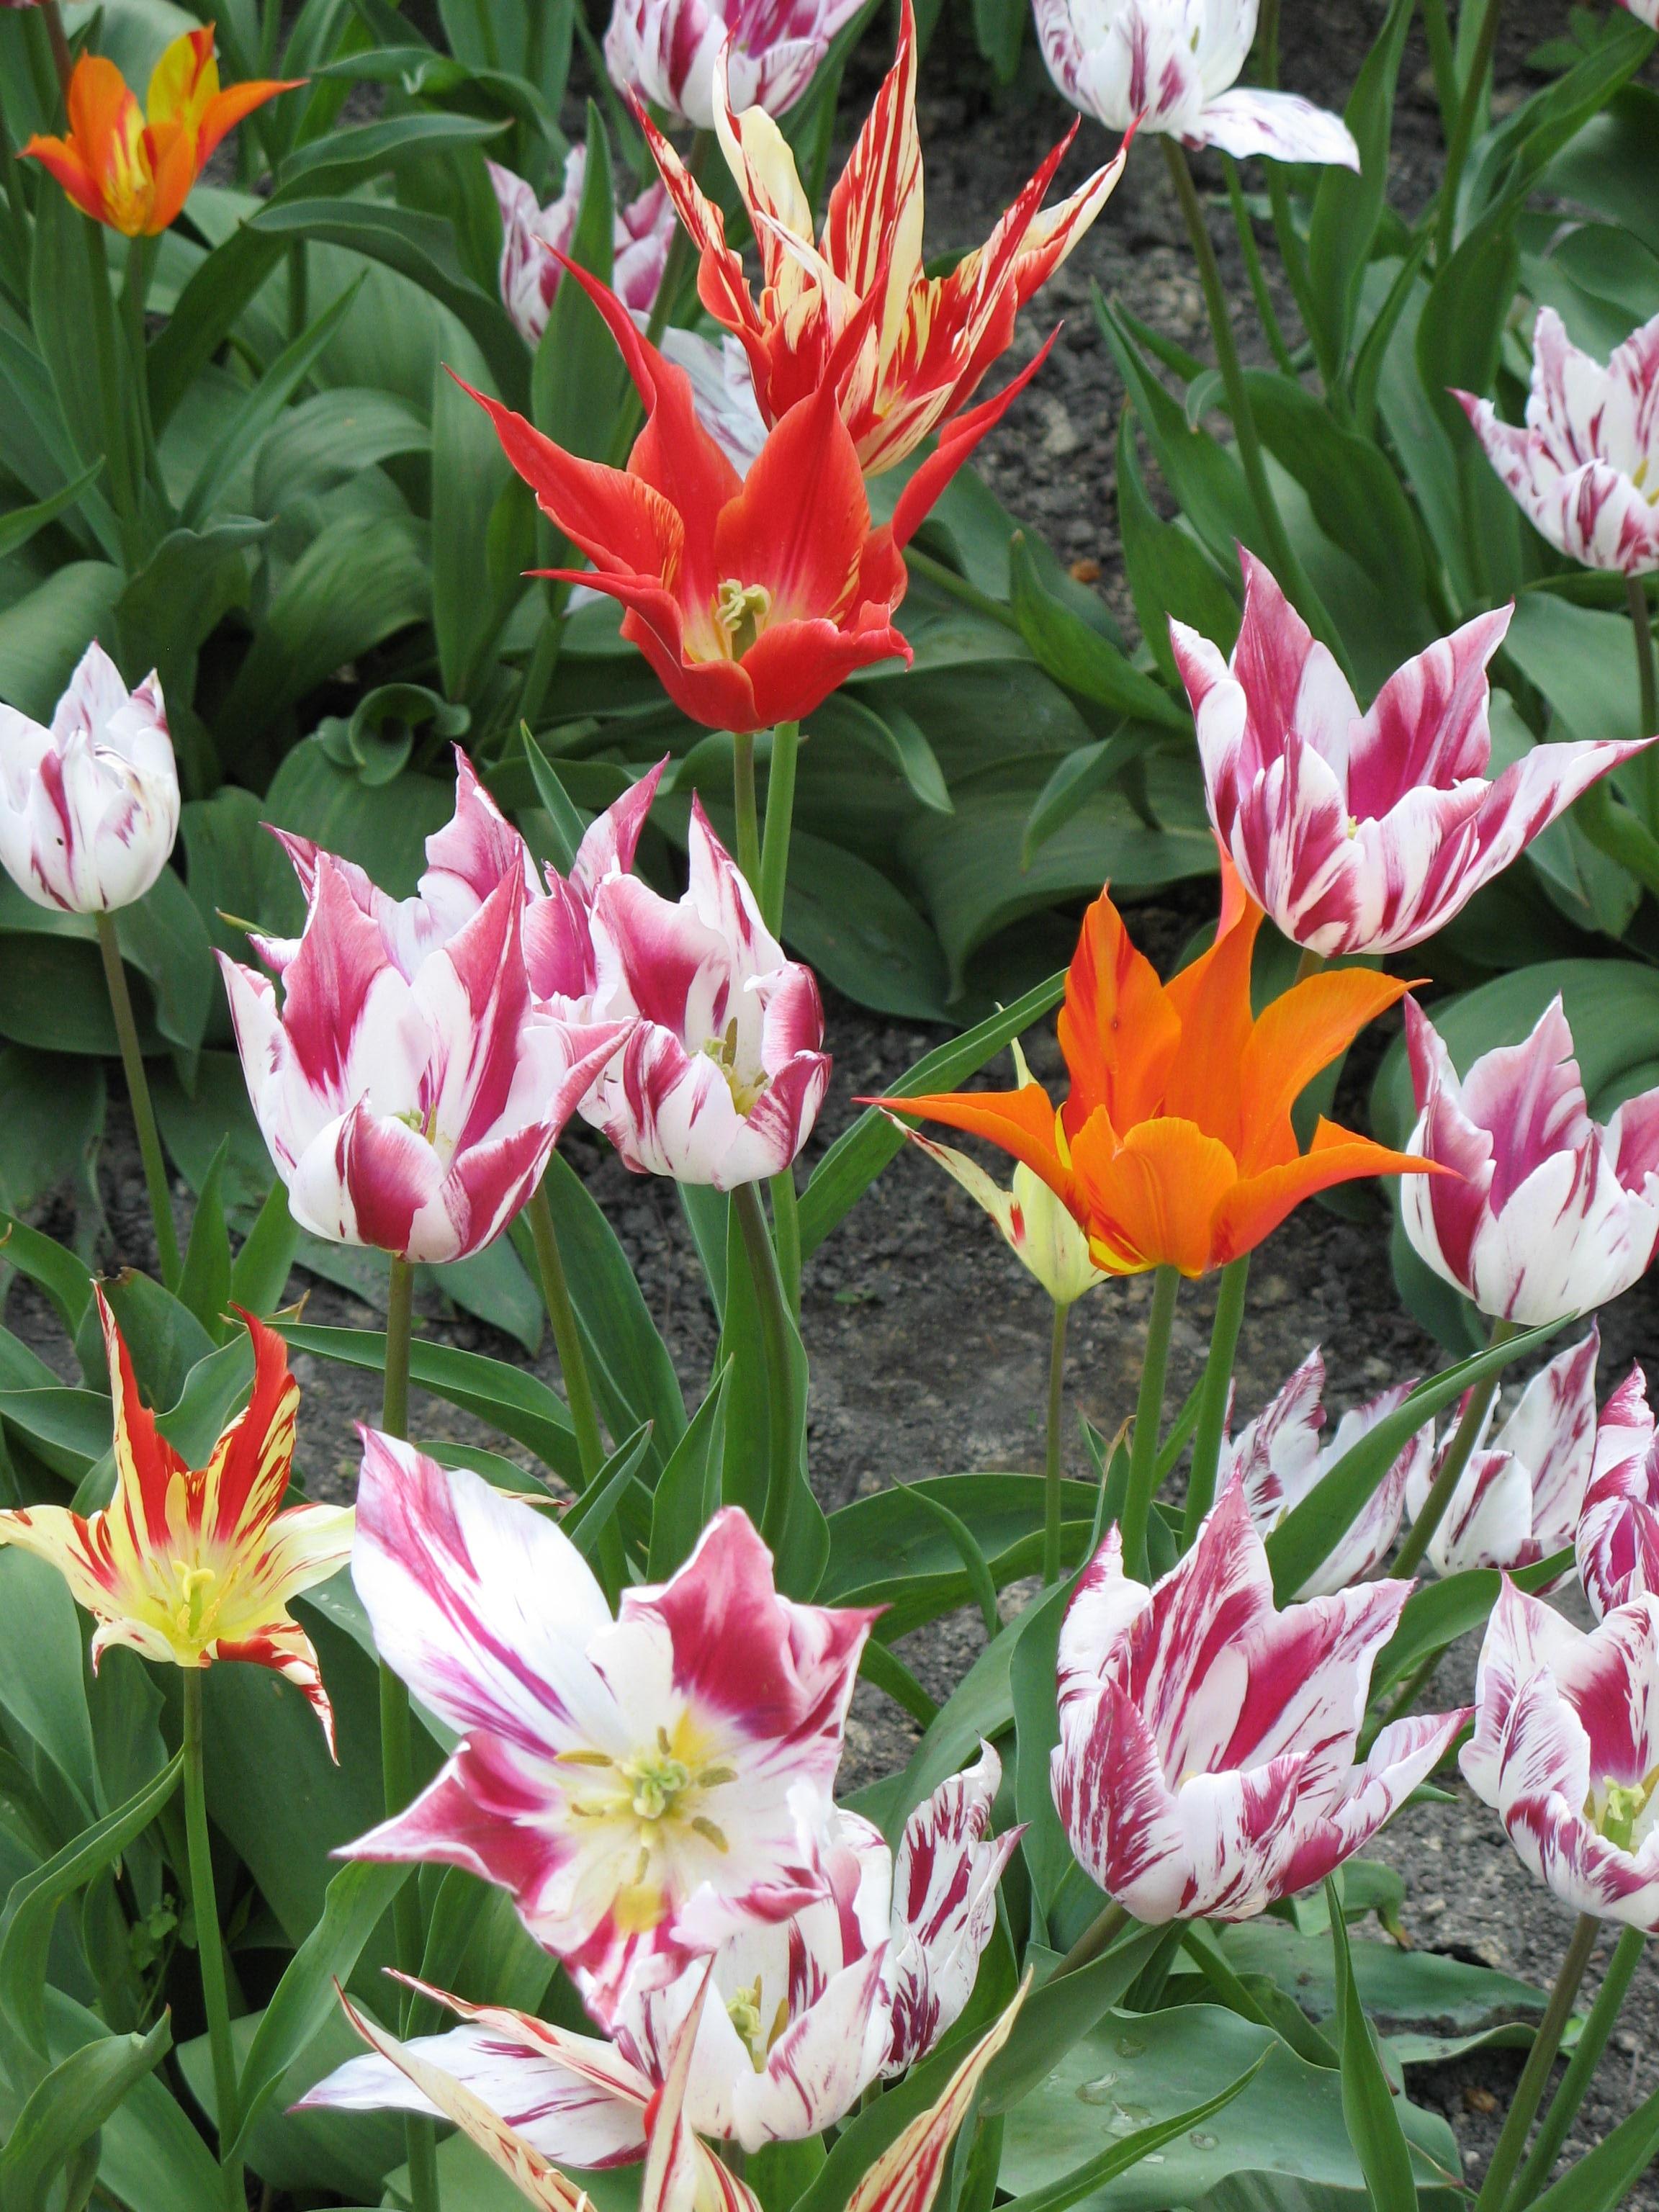 free images : nature, flower, petal, tulip, spring, botany, garden